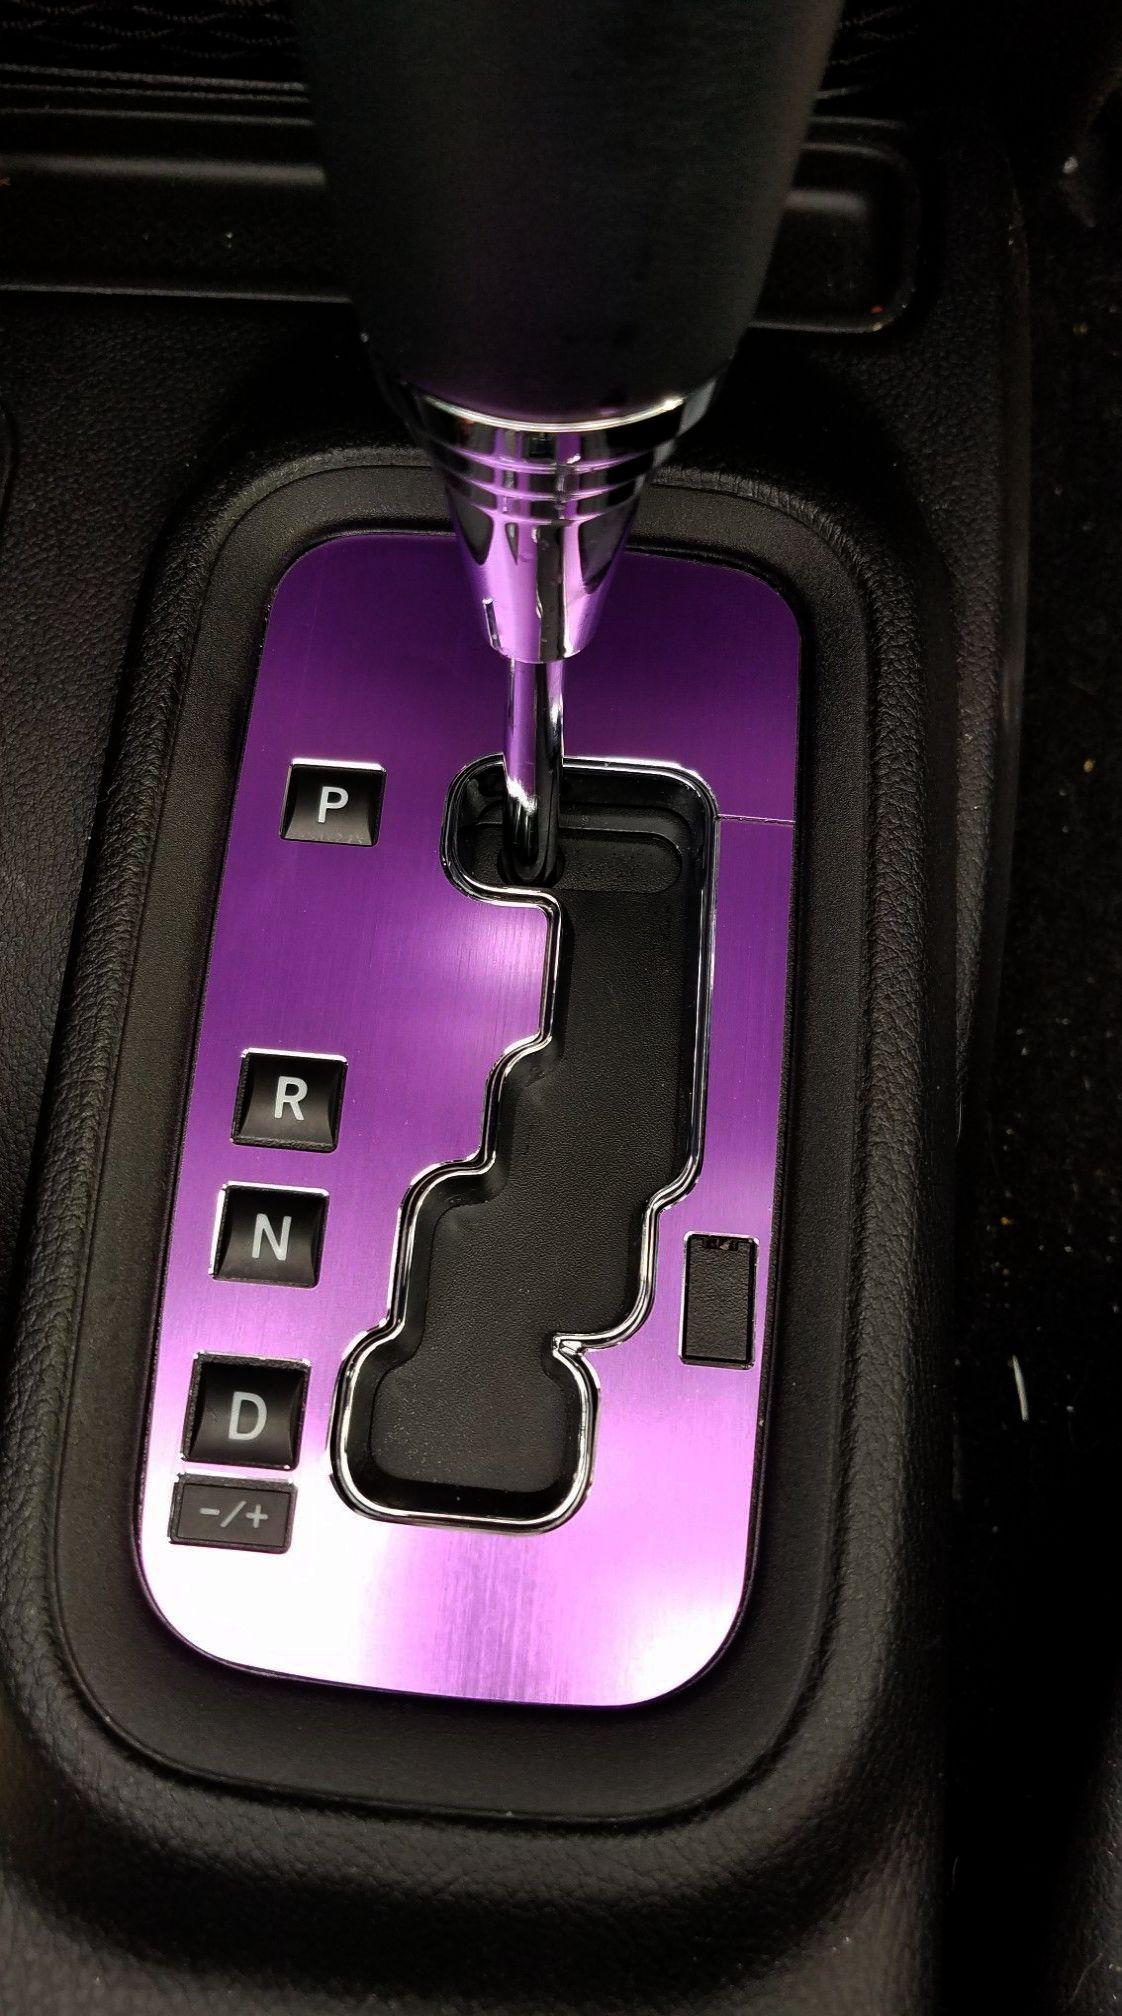 Used Cars For Sale Craigslist Nj : craigslist, Shield, Definition,, Whenever, Craigslist, Wrangler,, Cars,, Wrangler, Accessories